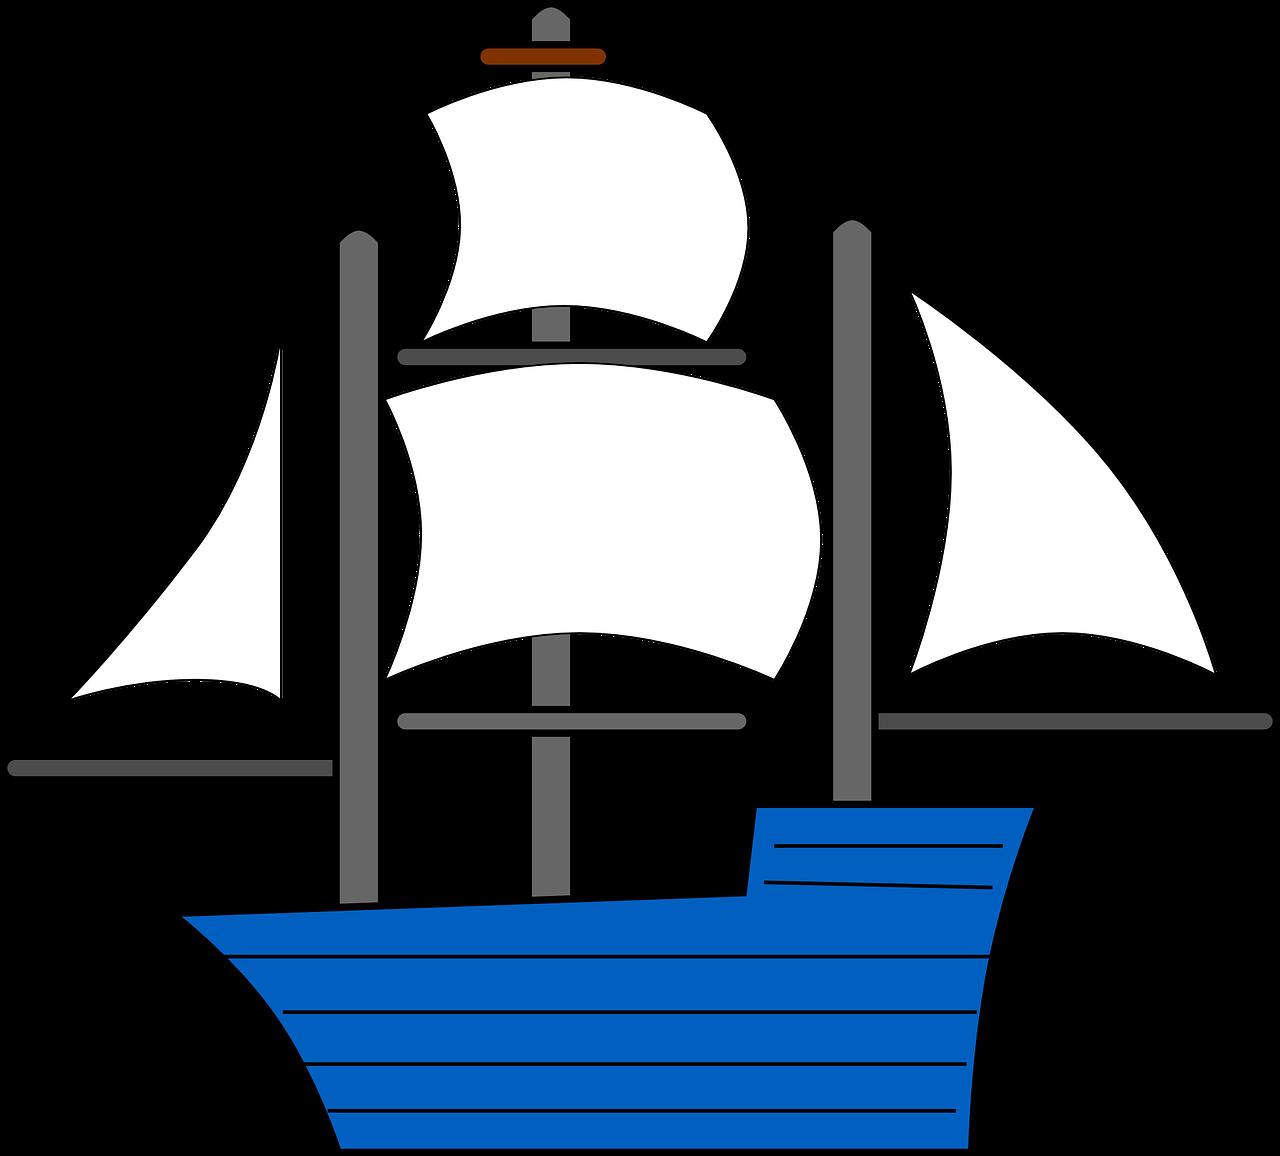 Sailboat clipart transparent Blue Sails image Ship Sailing